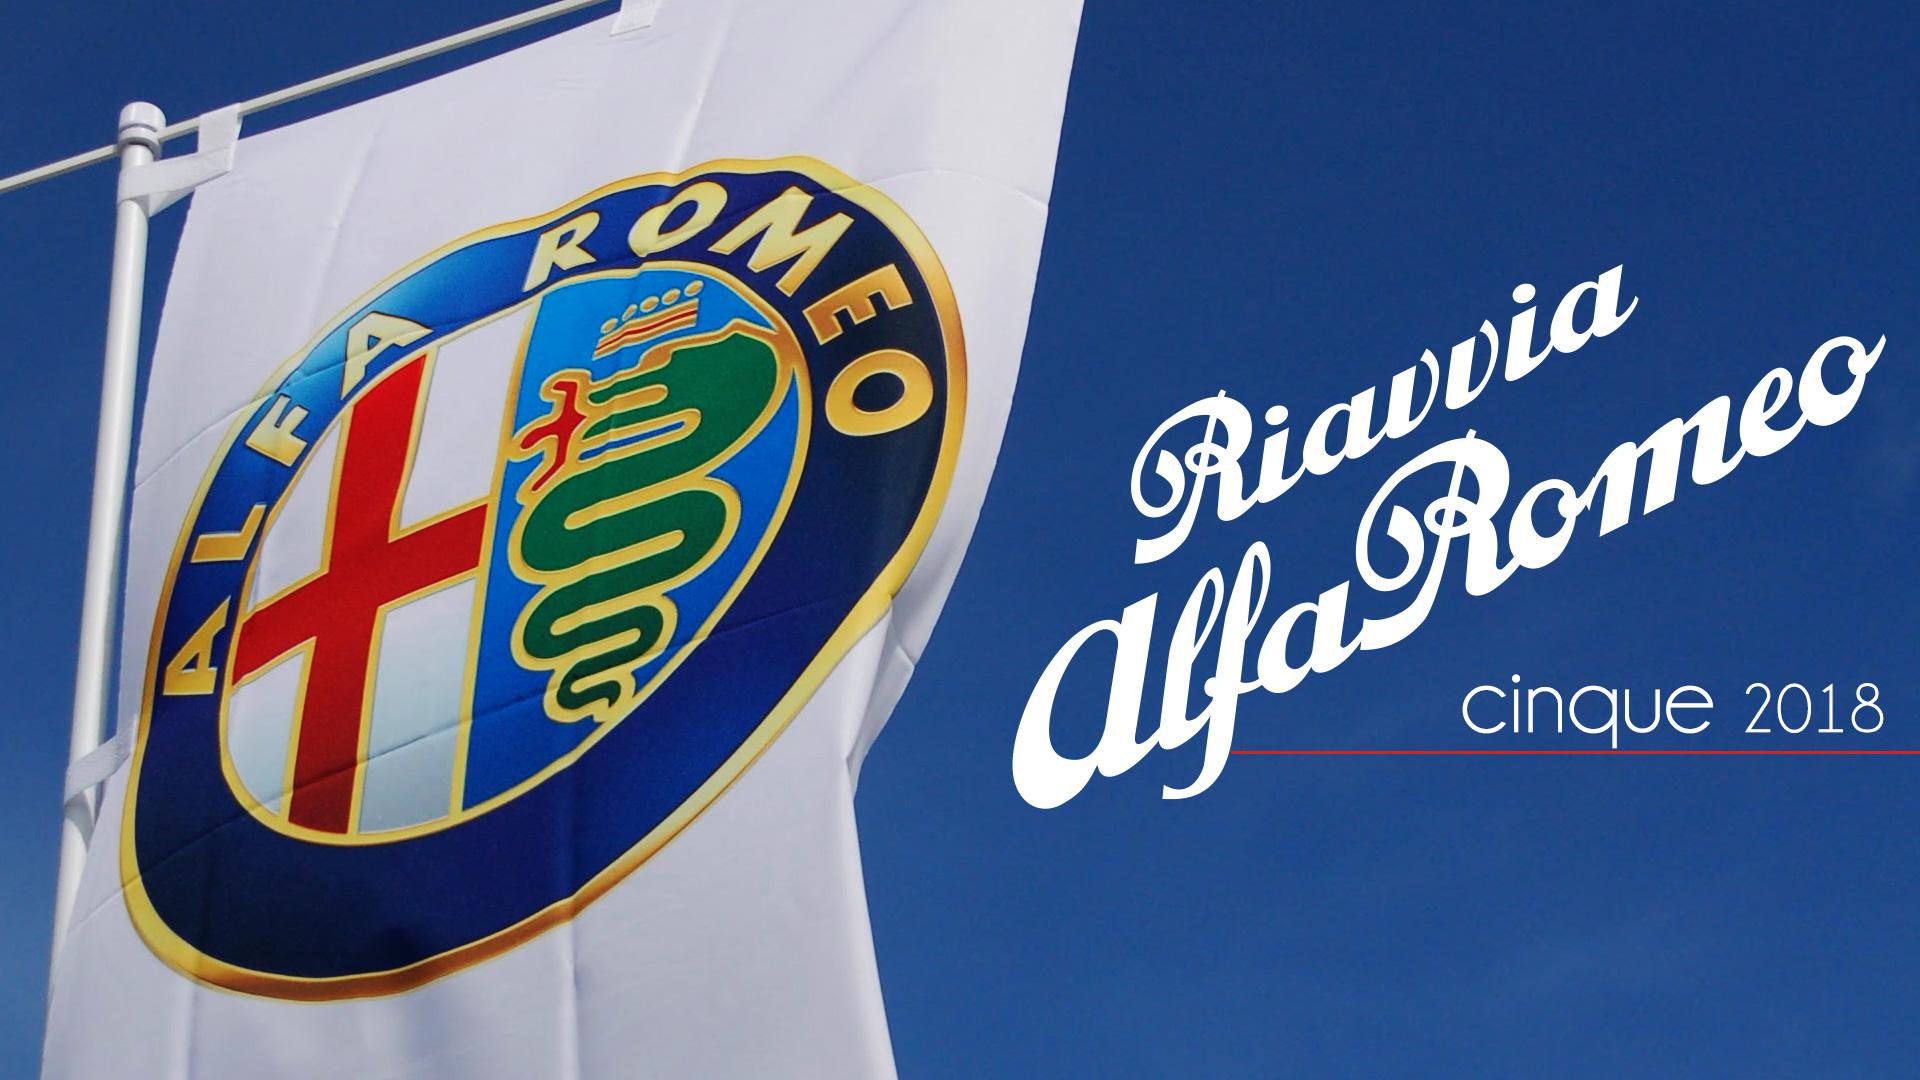 2018 Riavvia Alfa Romeo cinque